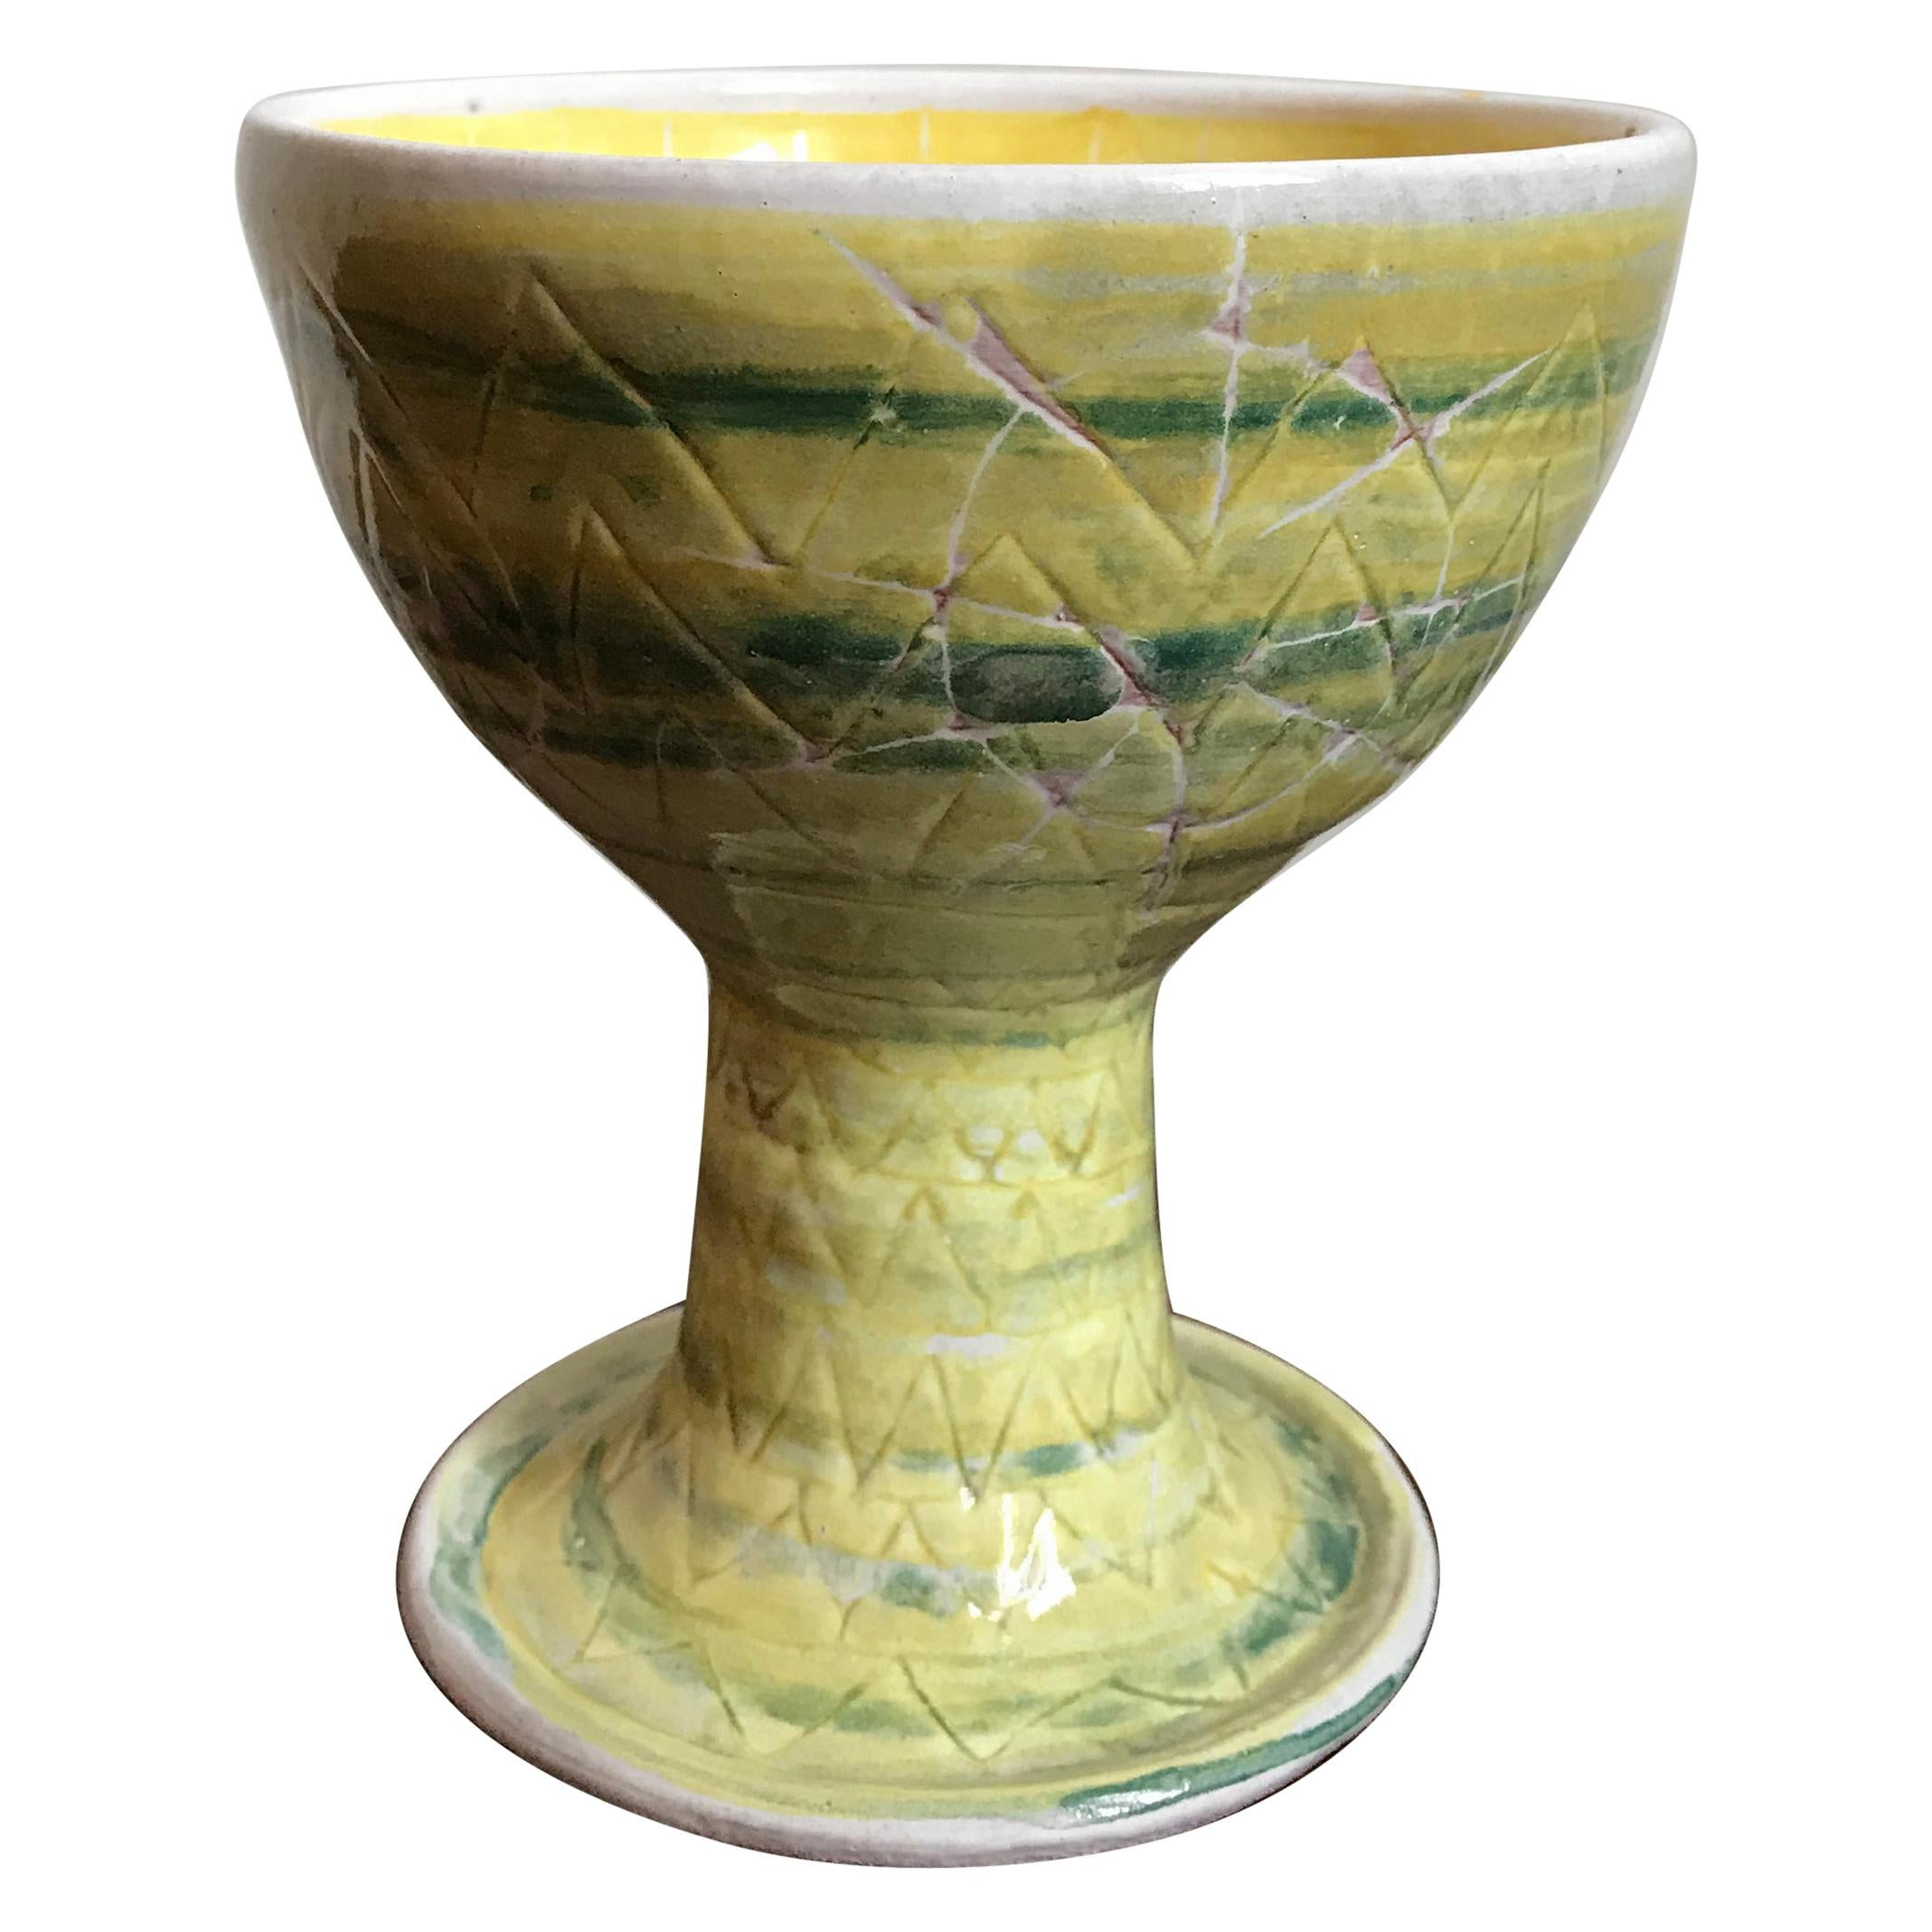 Guido Gambone Midcentury Italian Ceramic Vase, 1950s